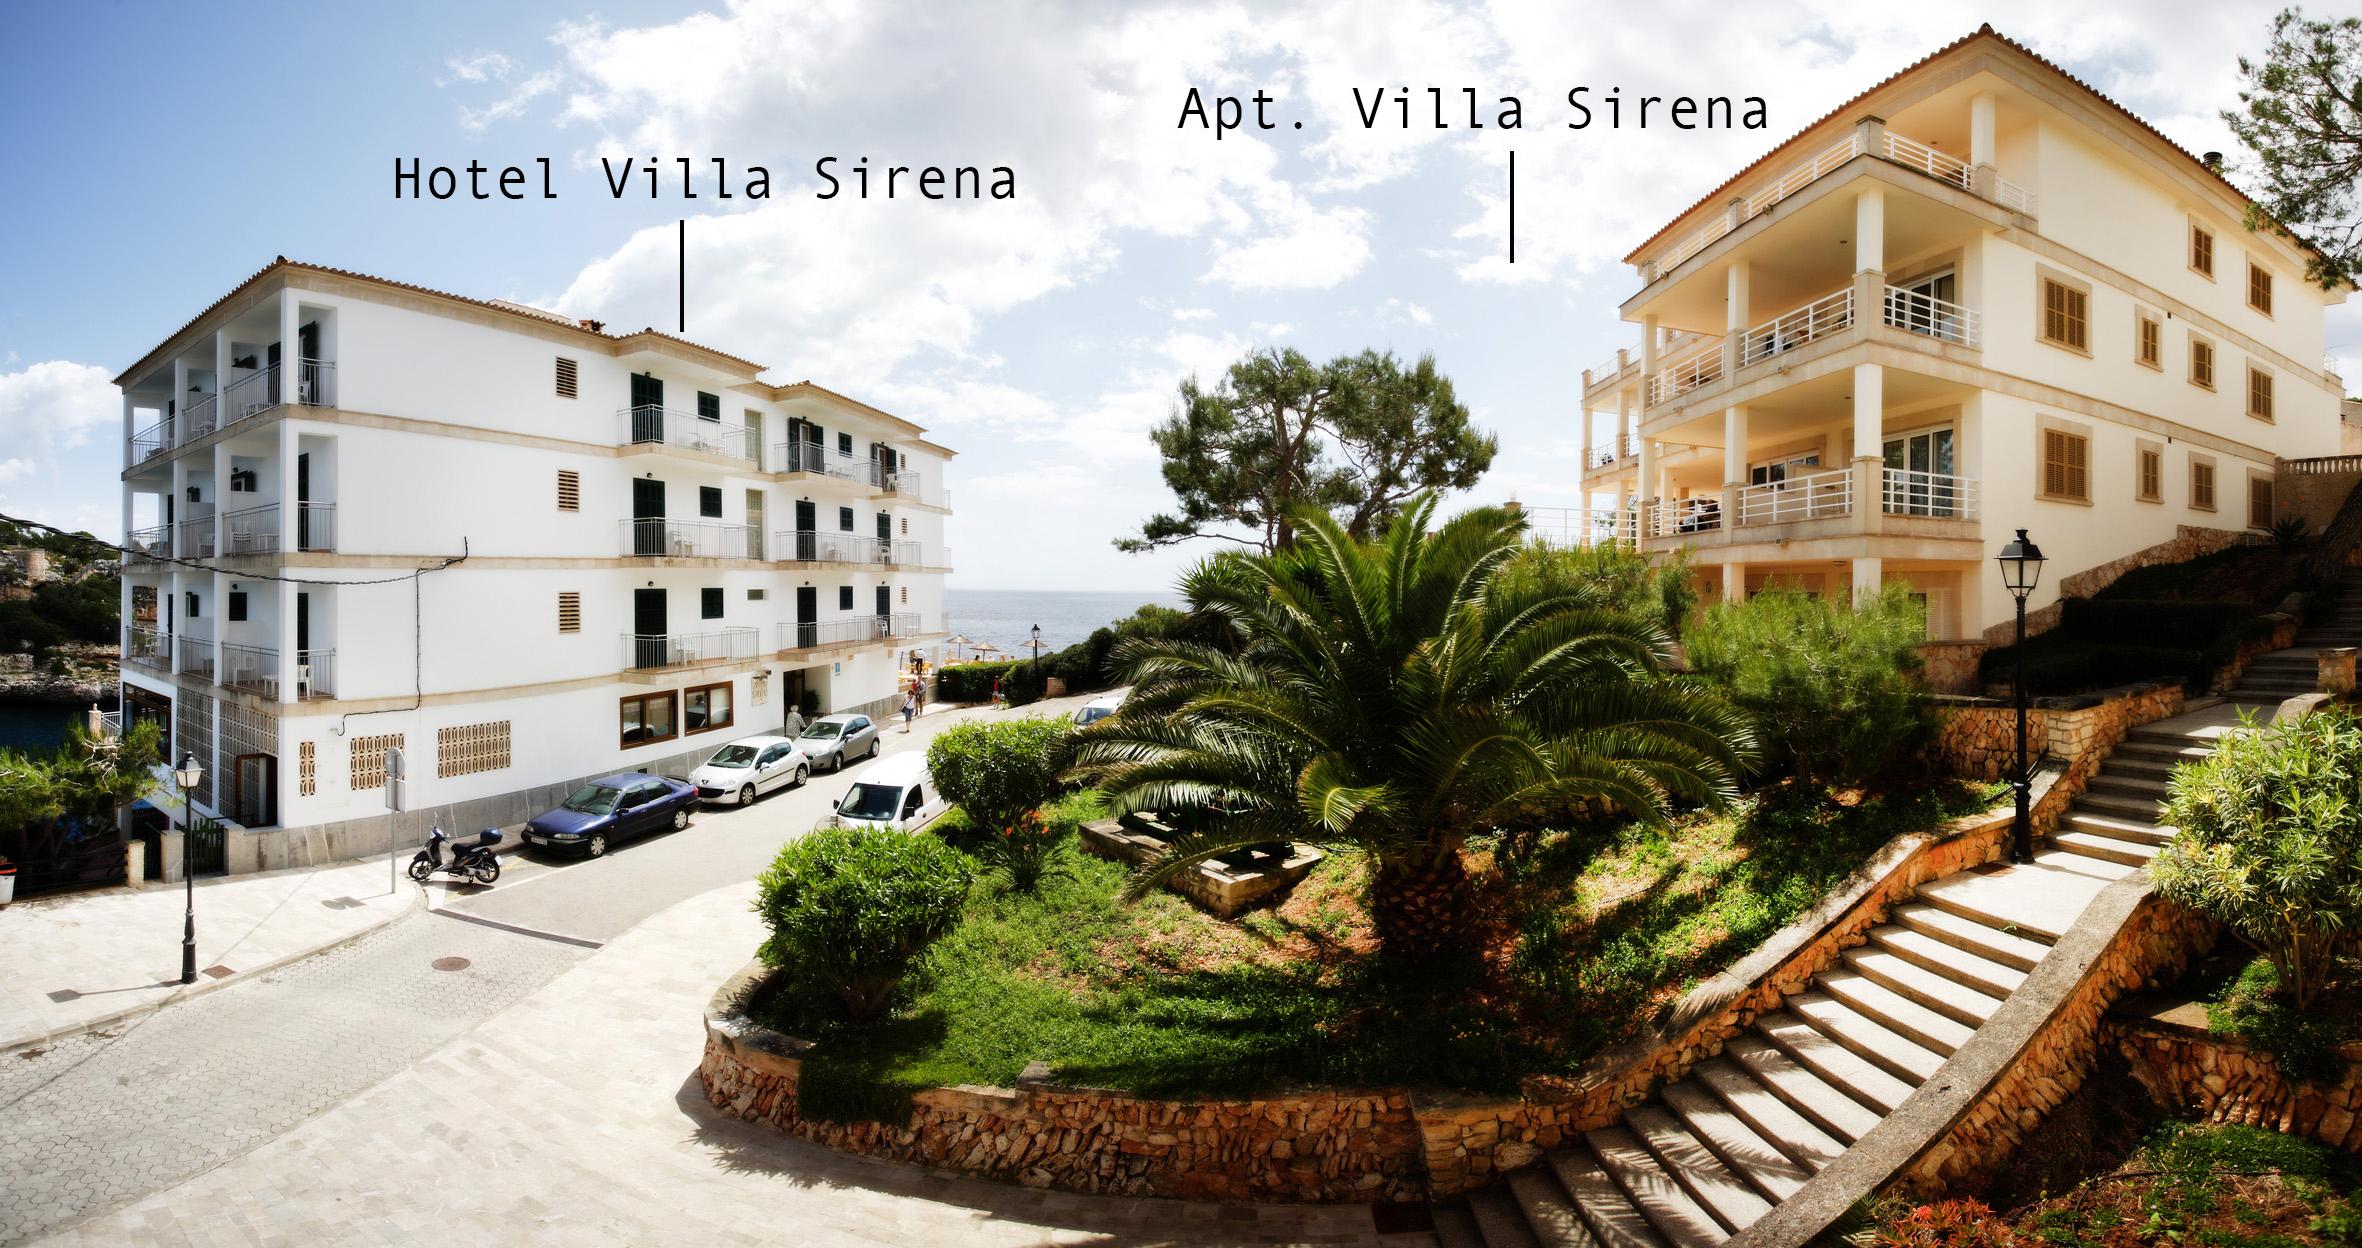 Hotel Villa Sirena-Apt.Villa Sirena